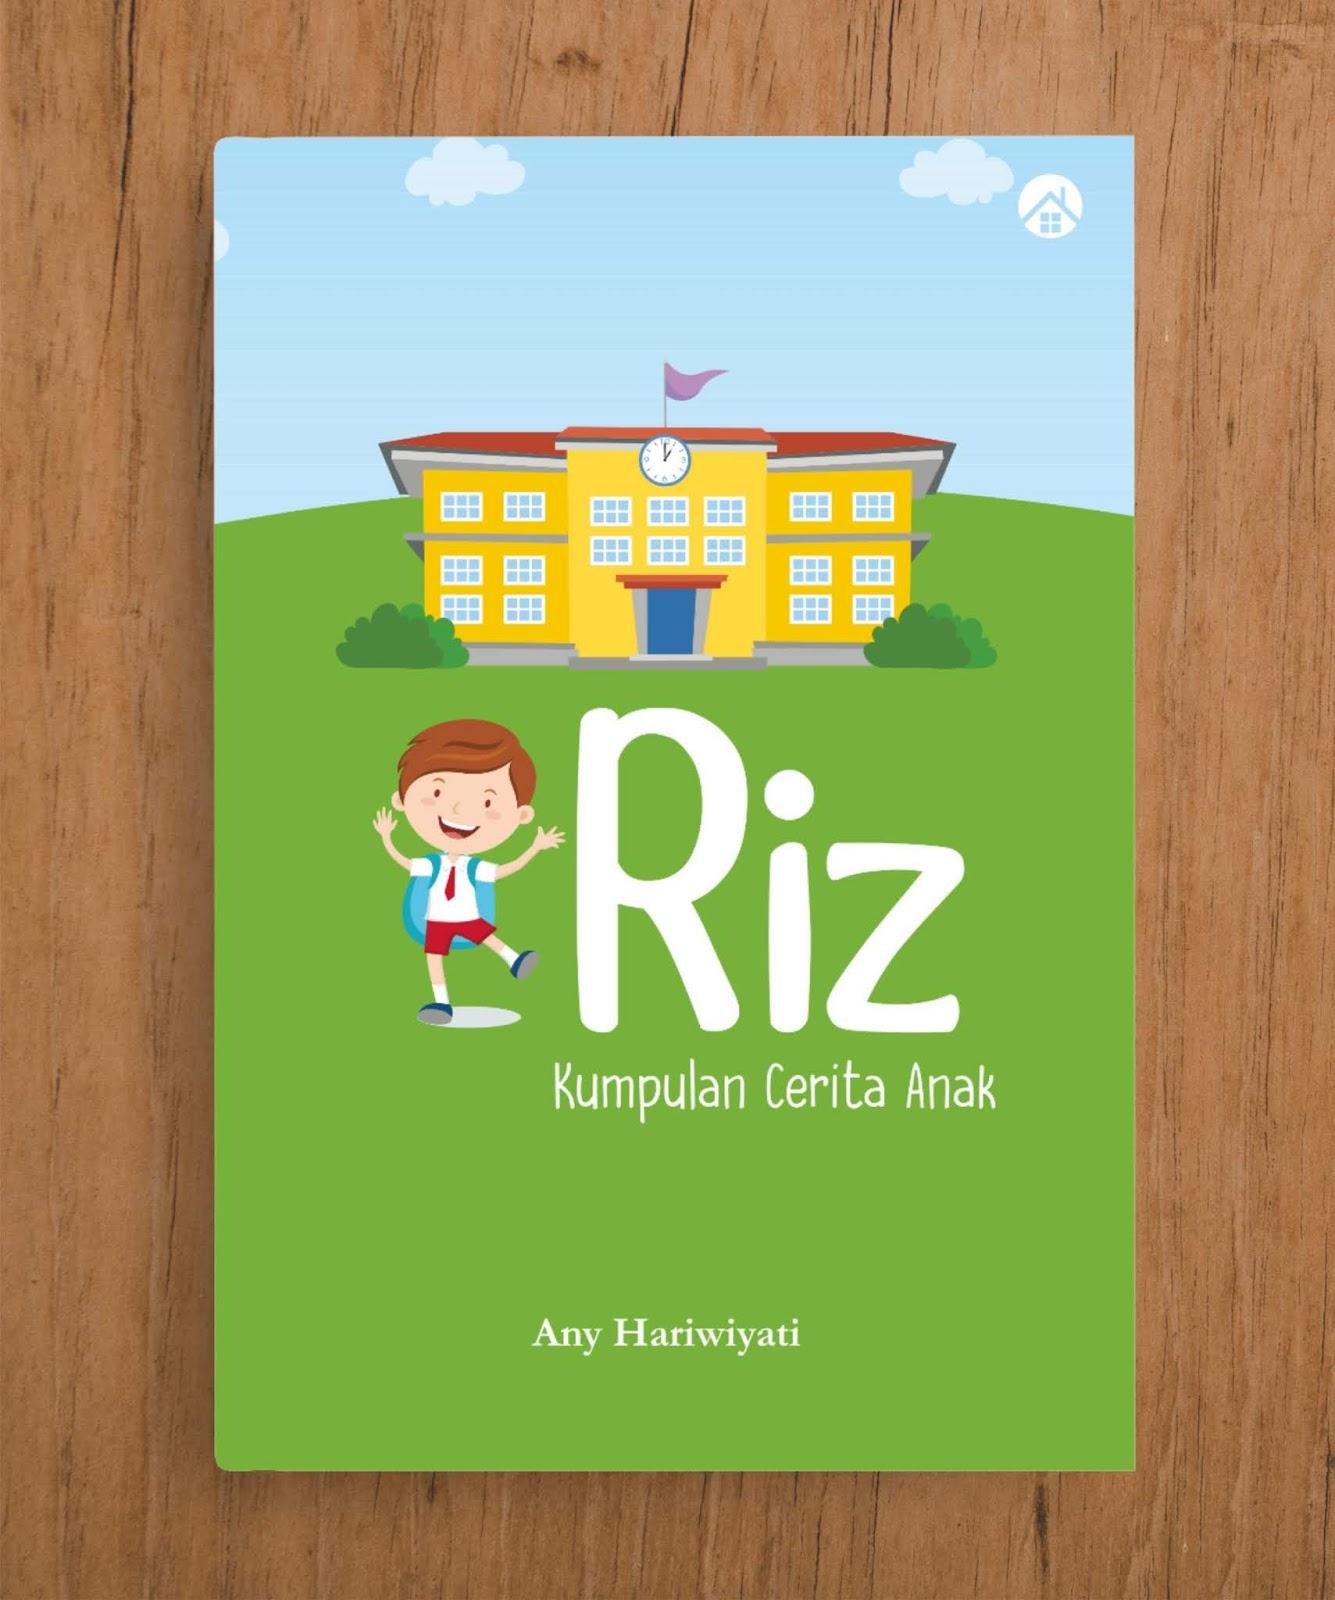 Riz (Kumpulan Cerita Anak)